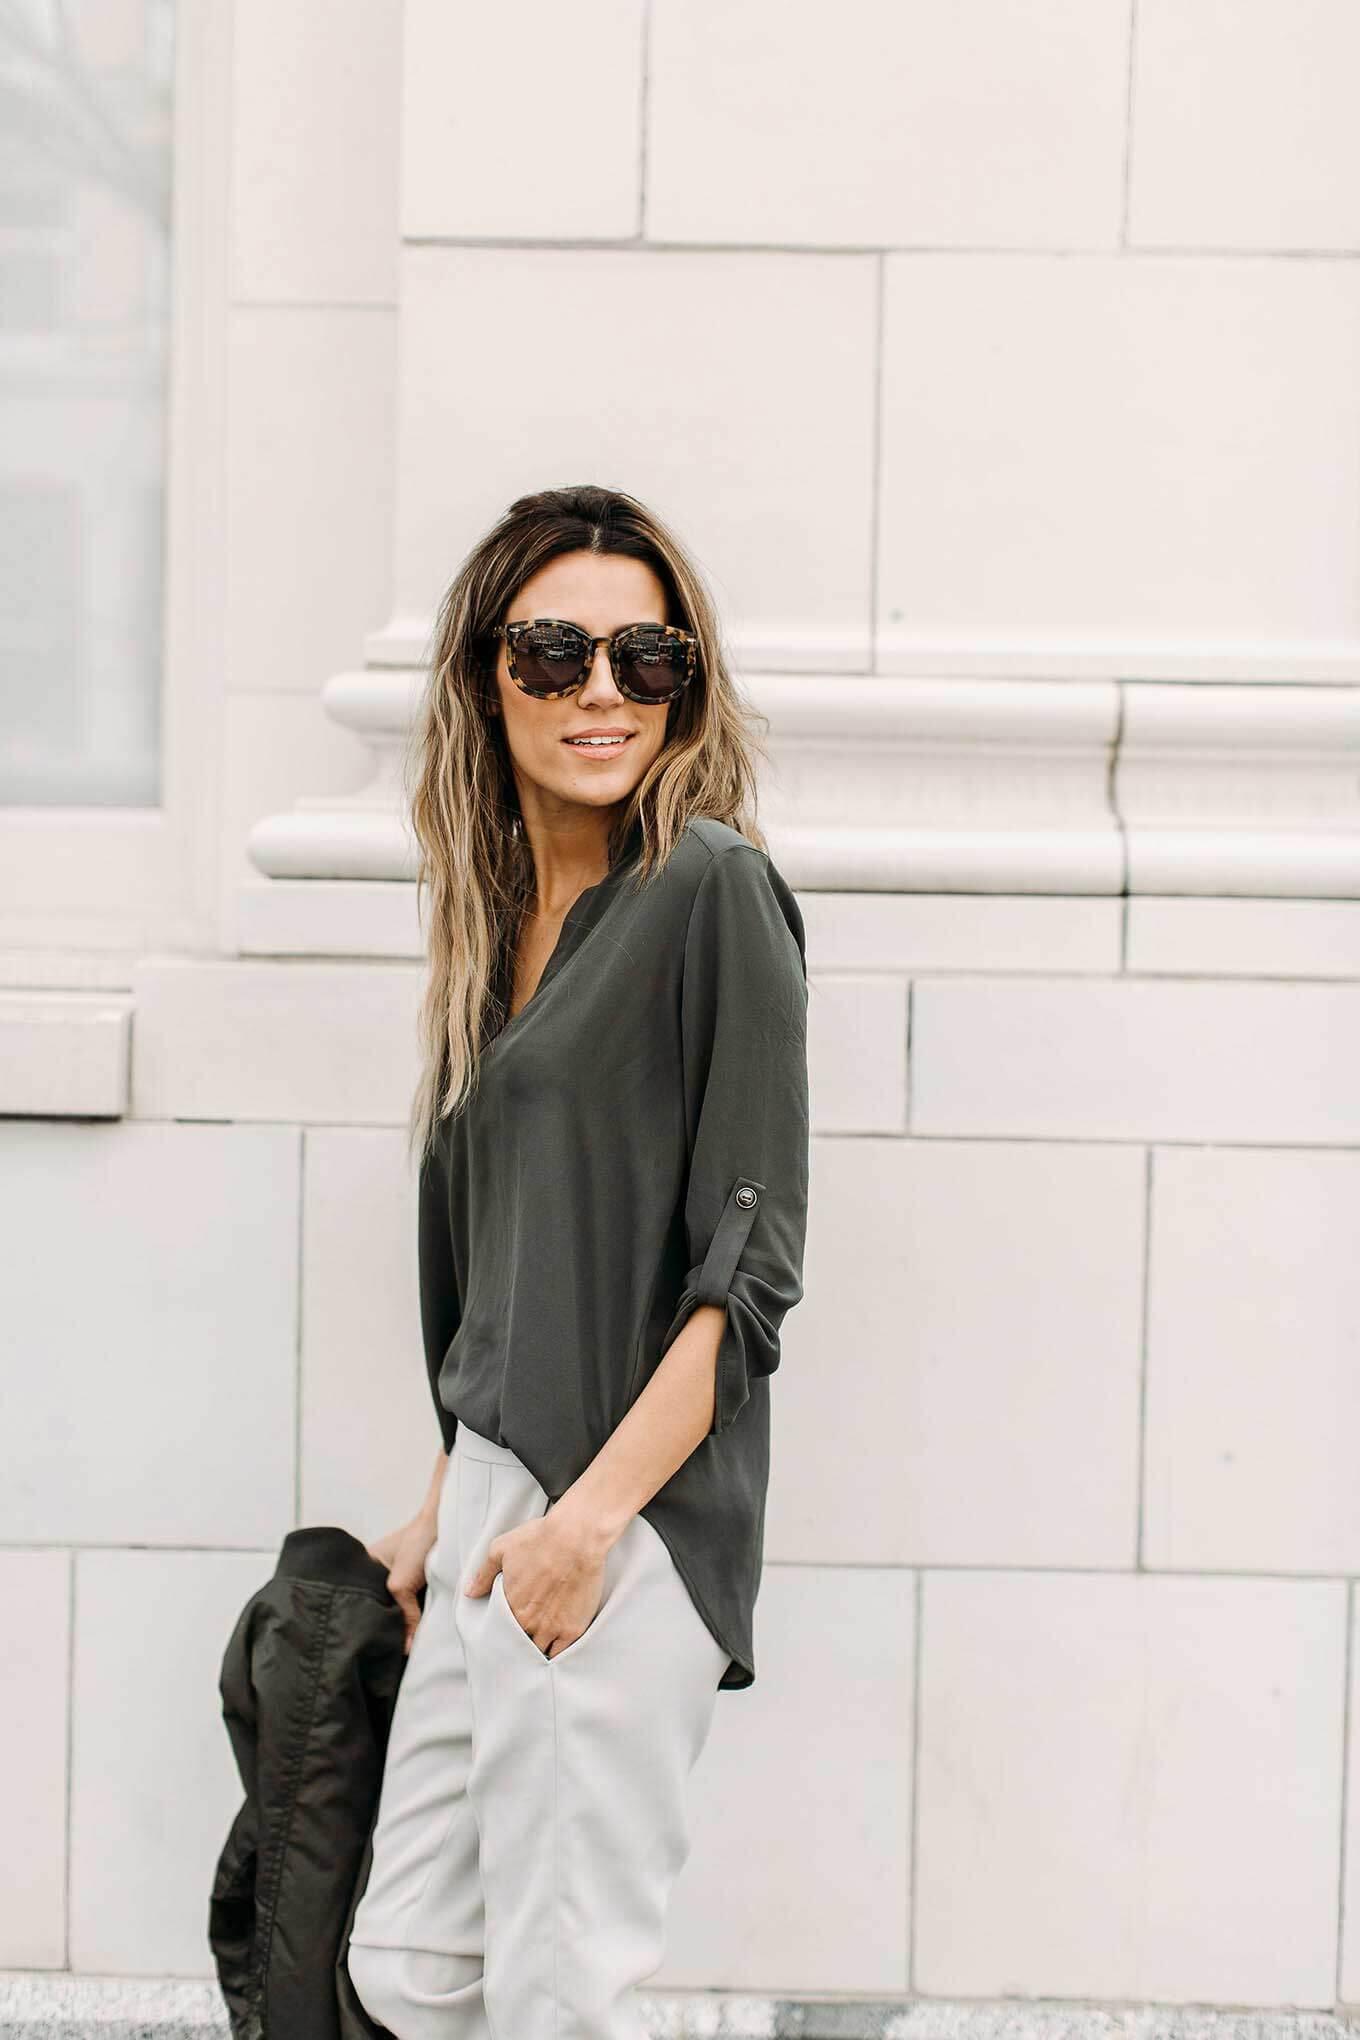 36 Best Sunglasses for Women in 2020